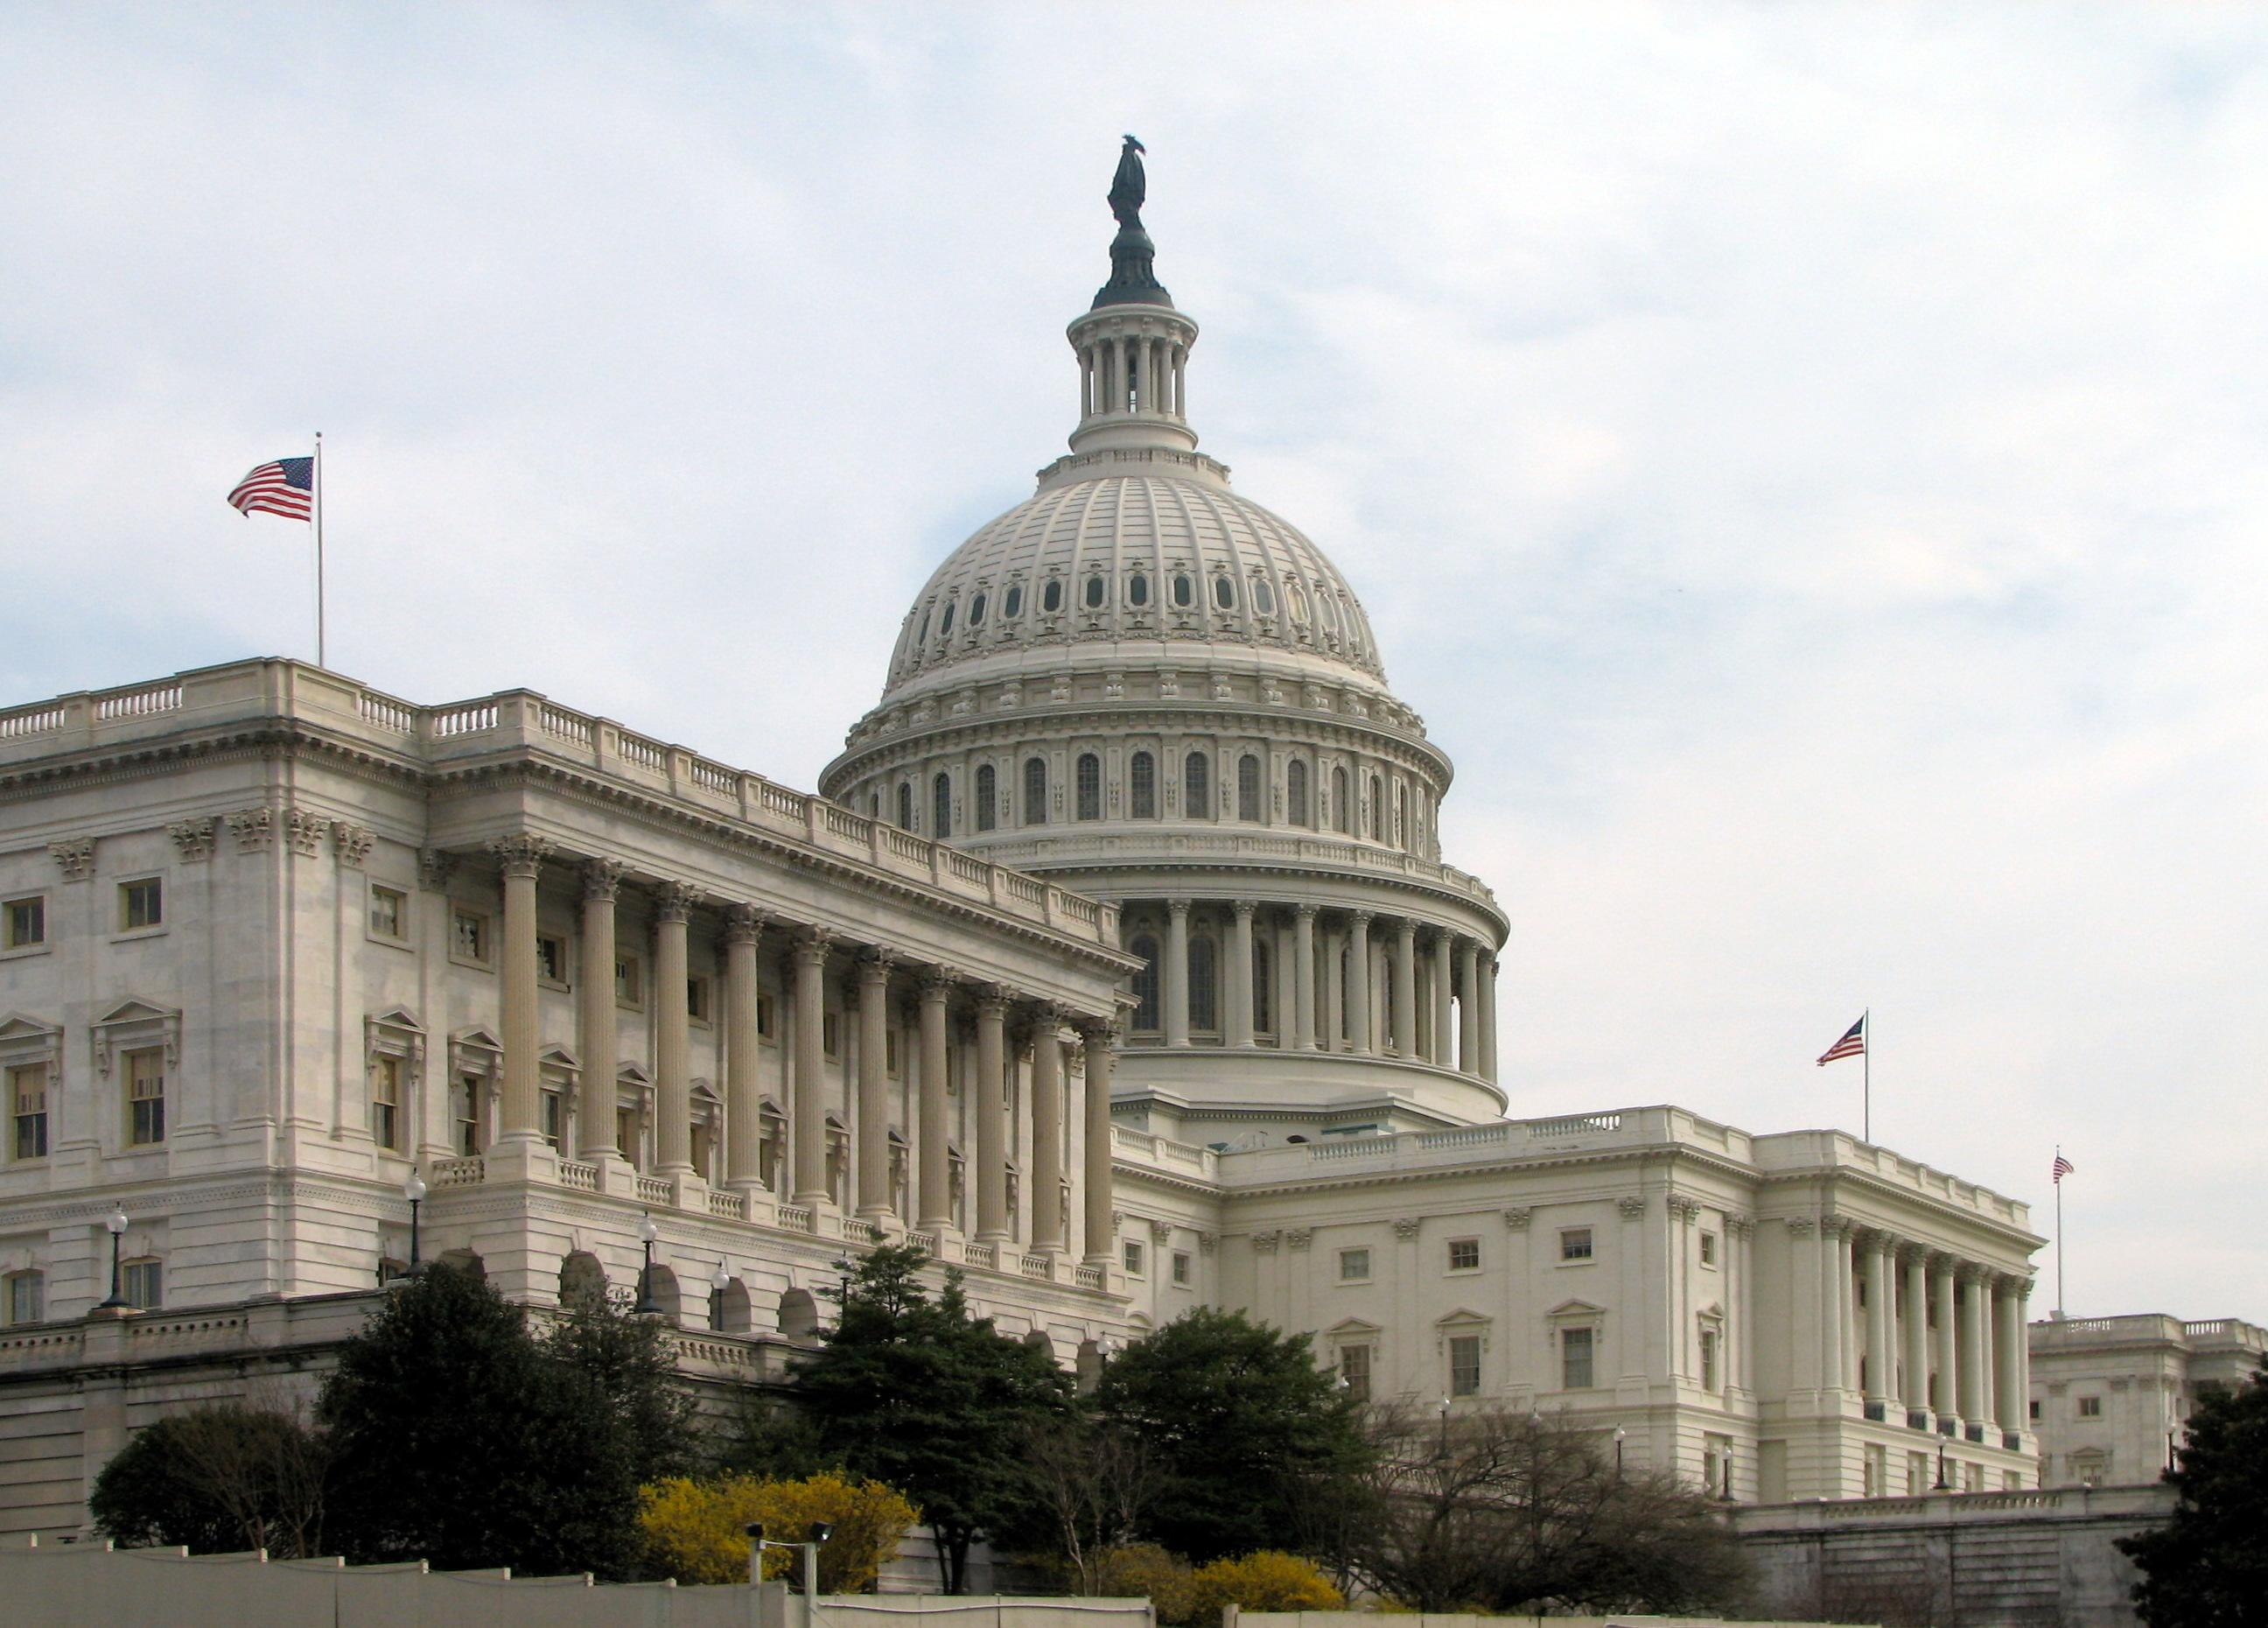 Arkansas' Congressional Delegates Sign Amicus Brief in Major Pro-Life Case